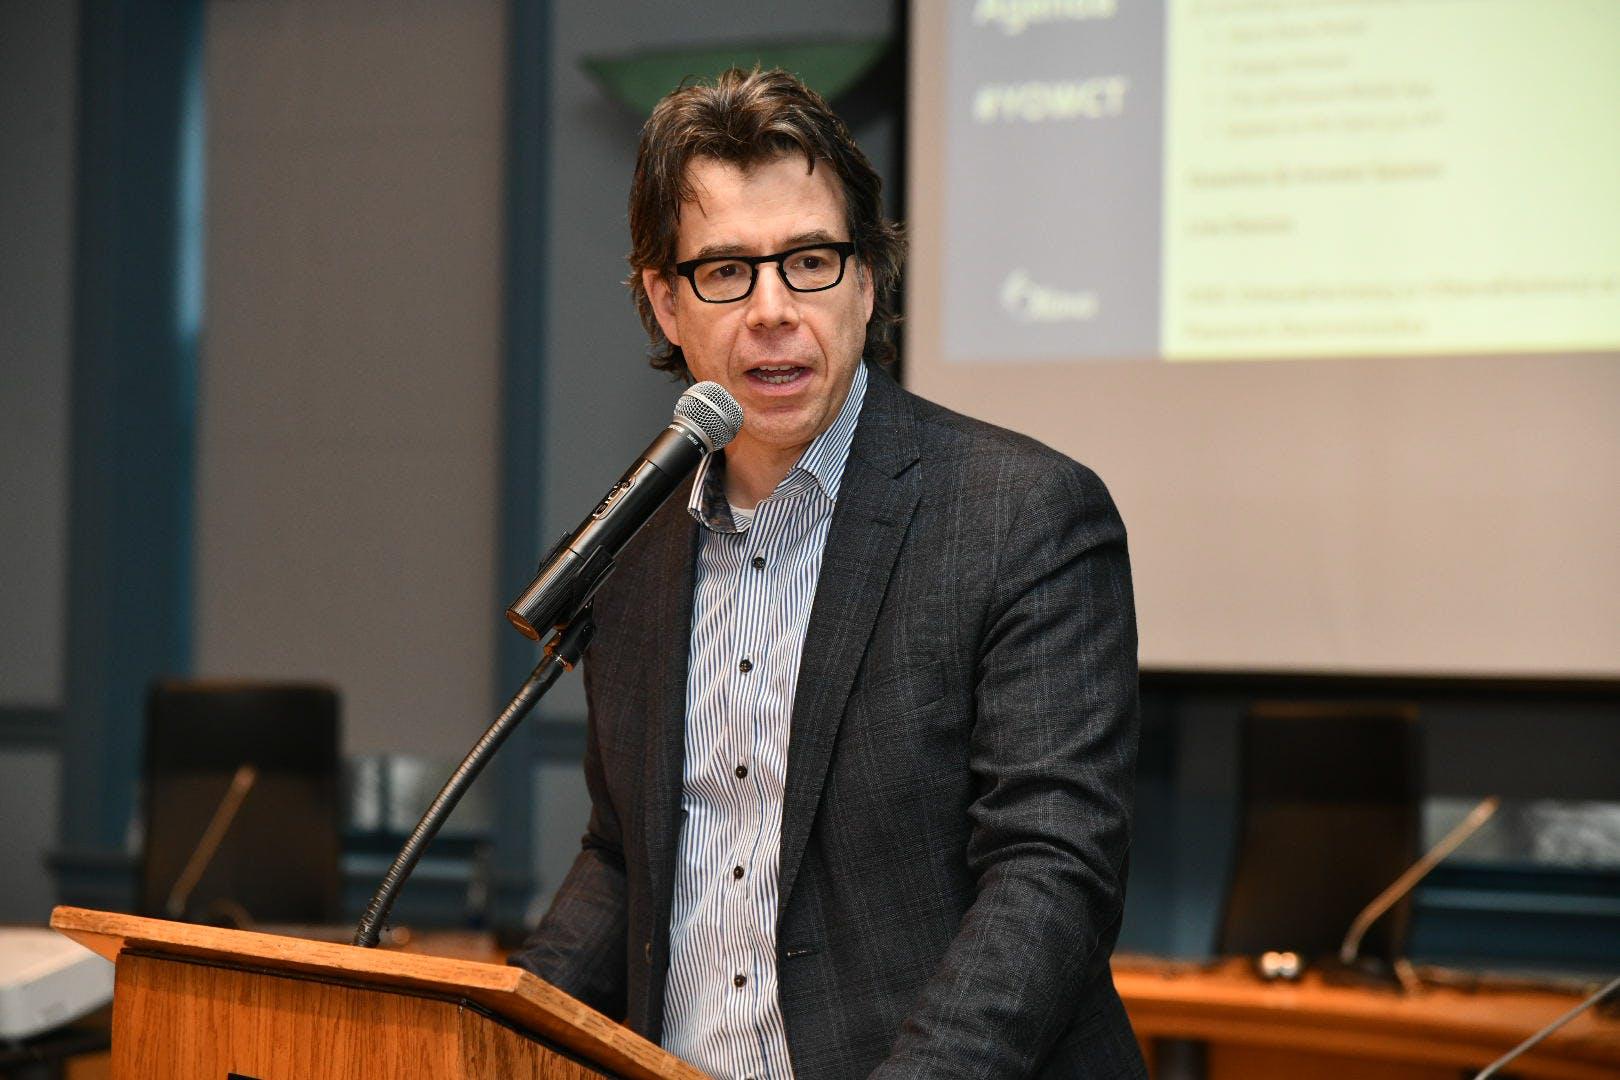 Civic Tech Presents: Smart City 2.0 | April 2, 2019